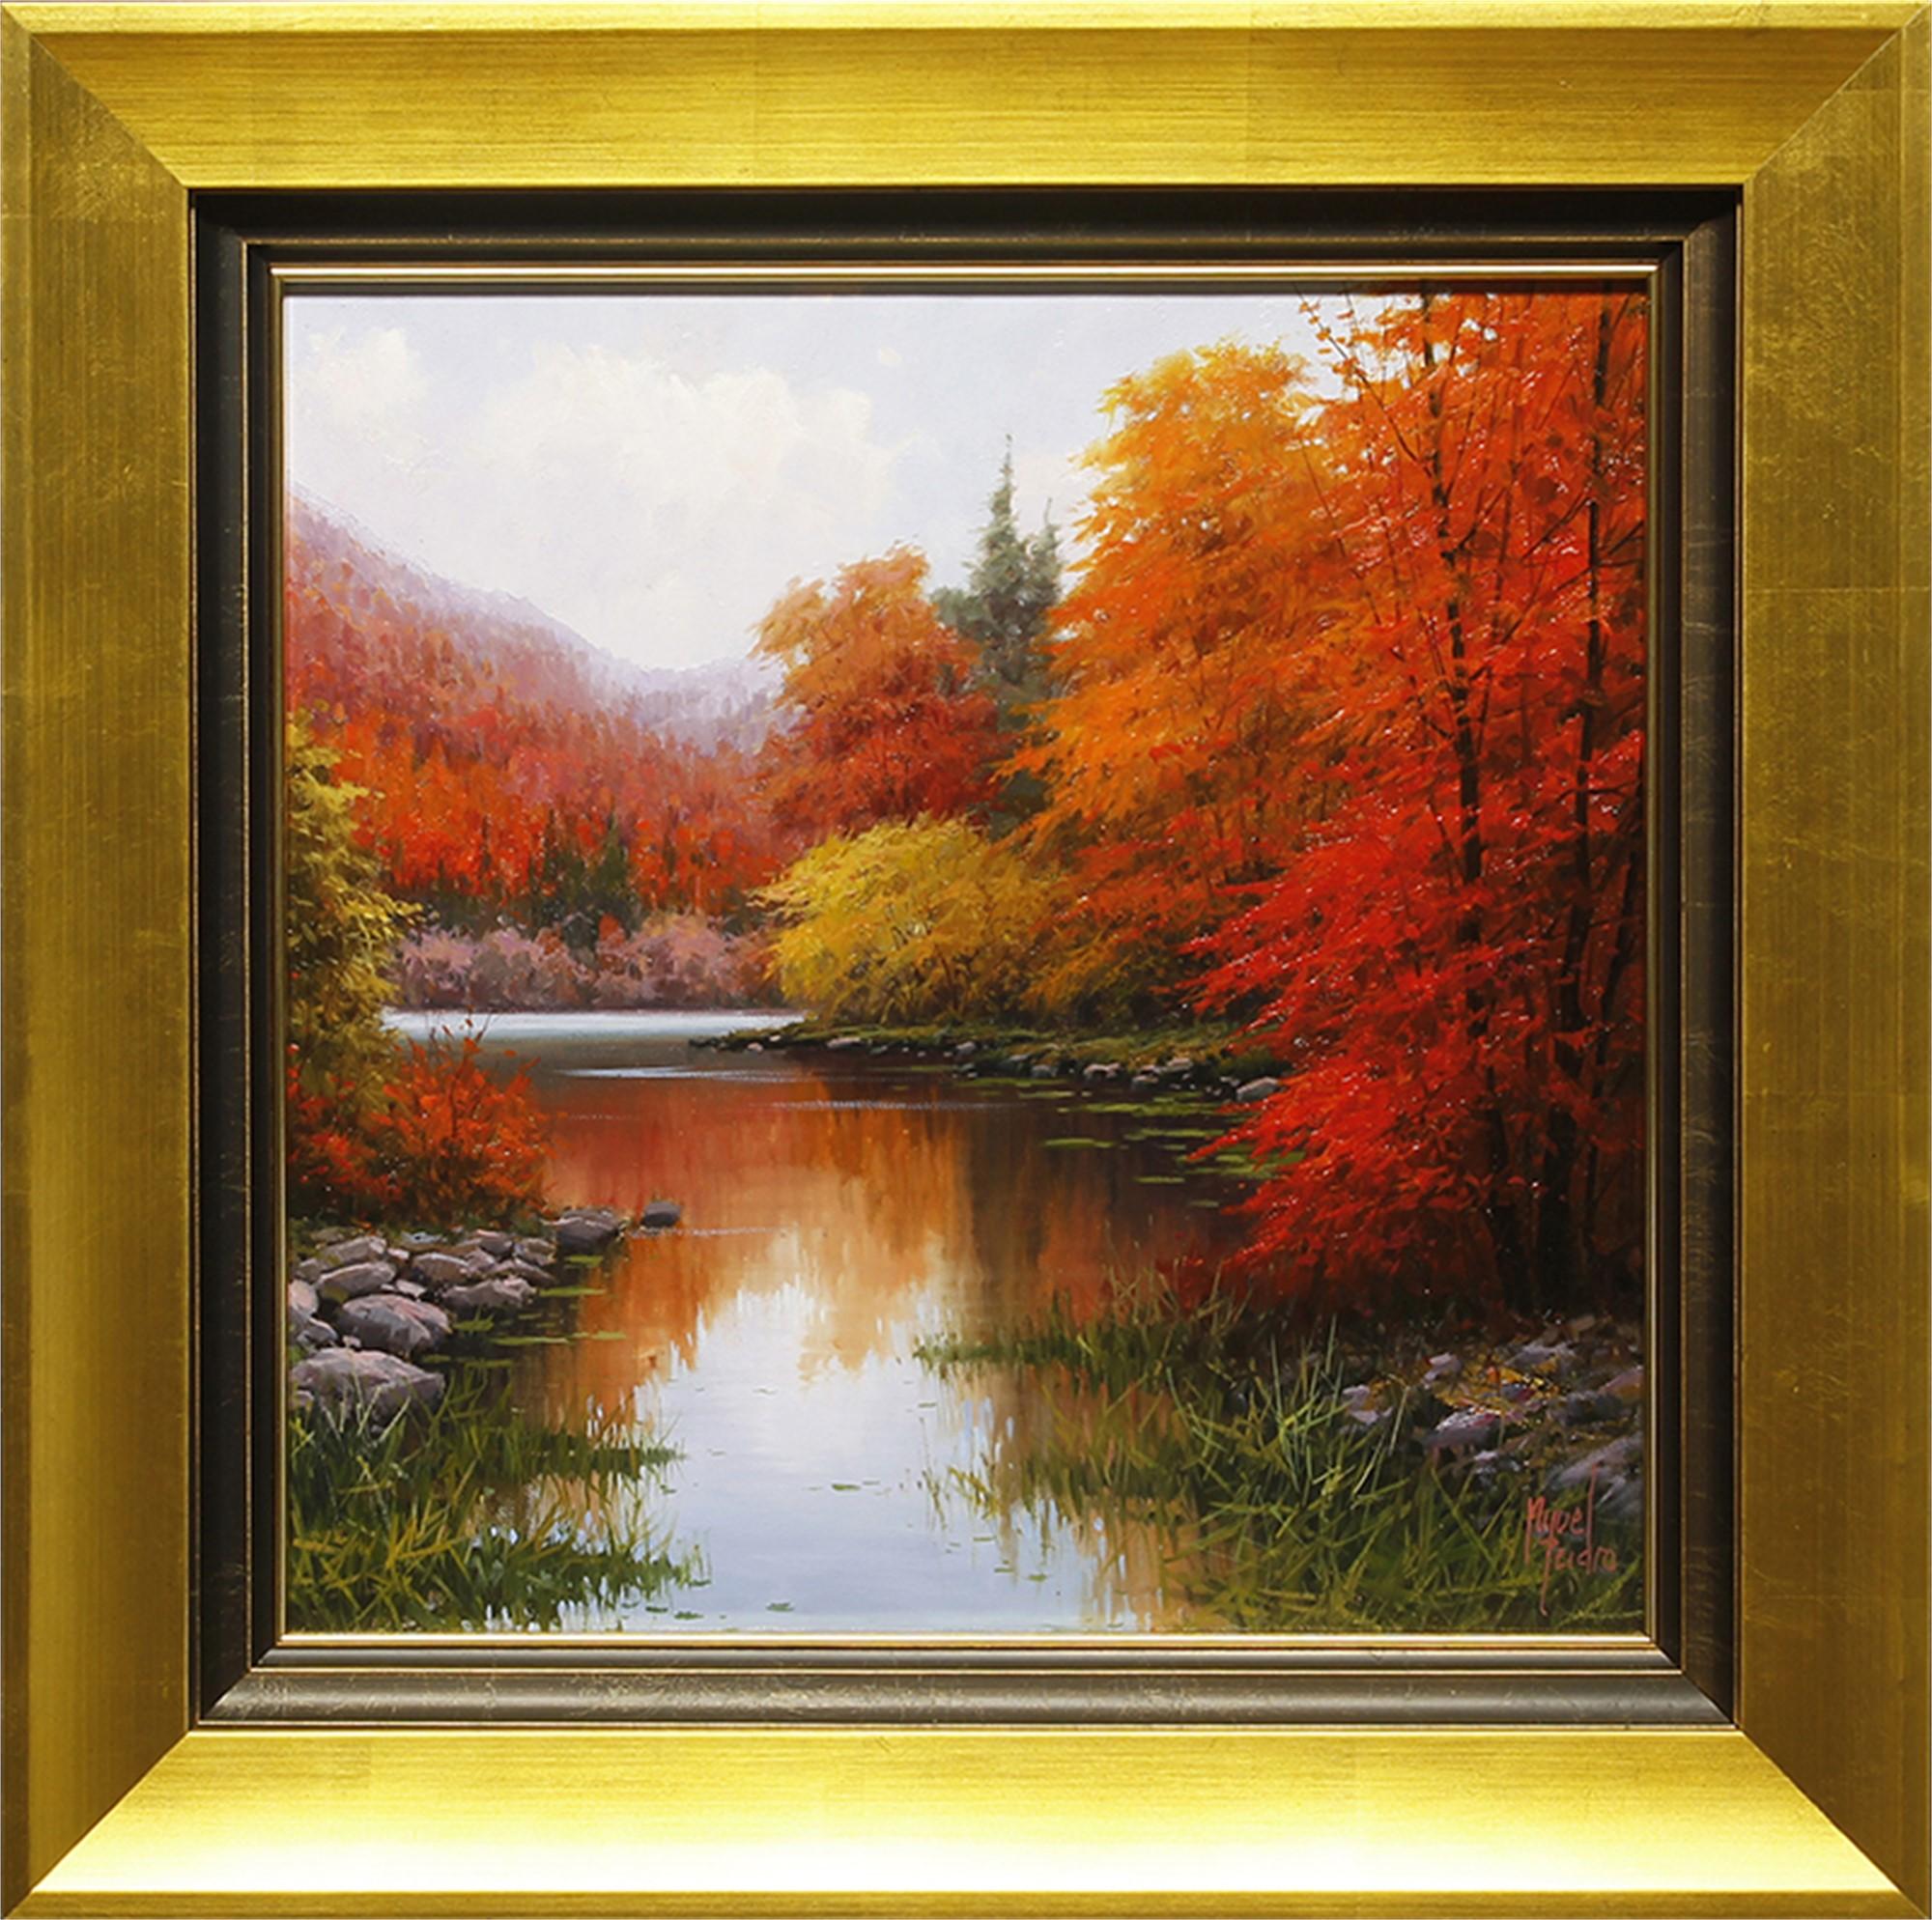 Garona River in Autumn by Miguel Peidro